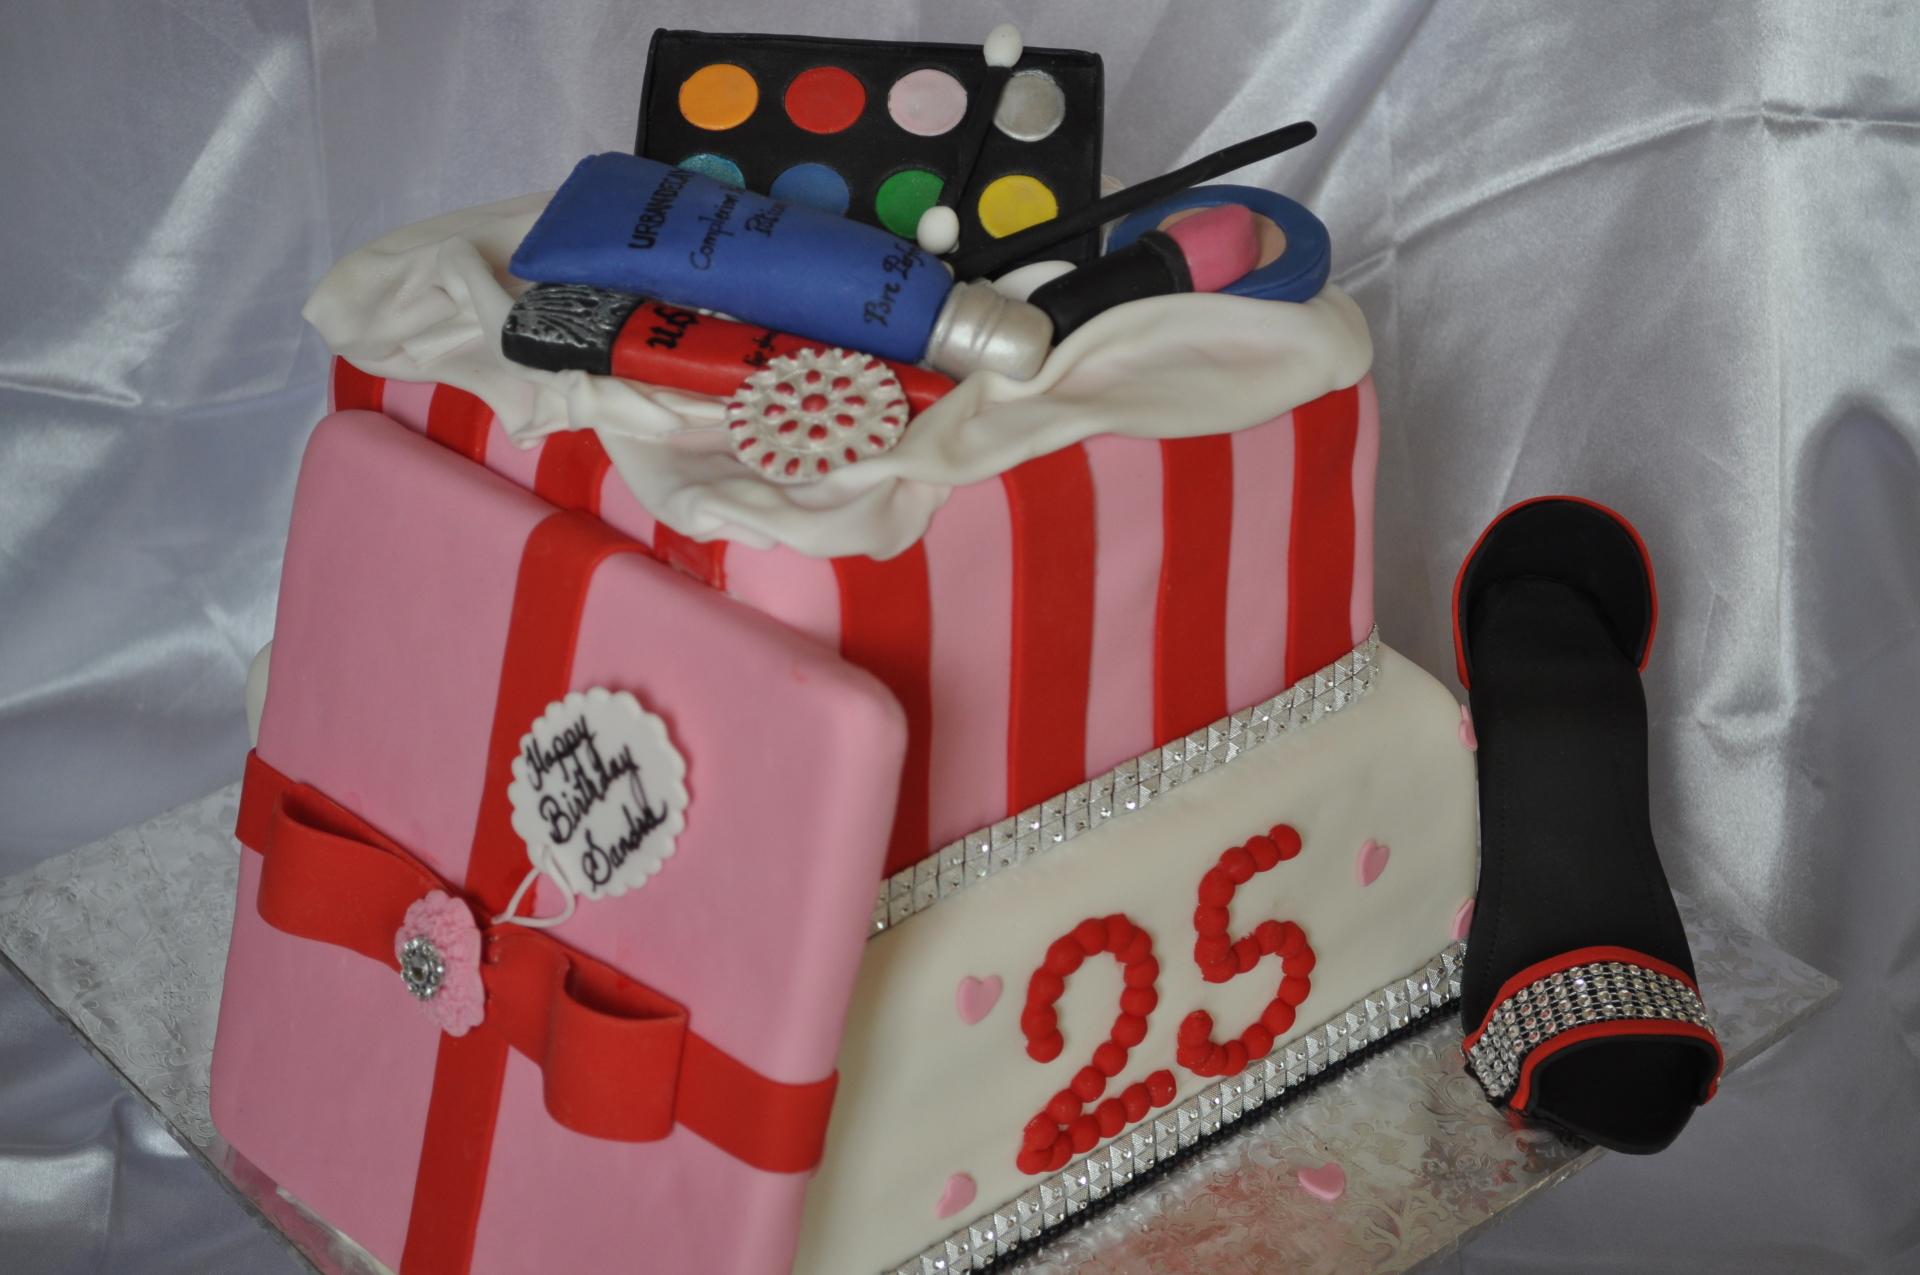 Make up cake, 25th birthday cake, fashionista cake,glam cake